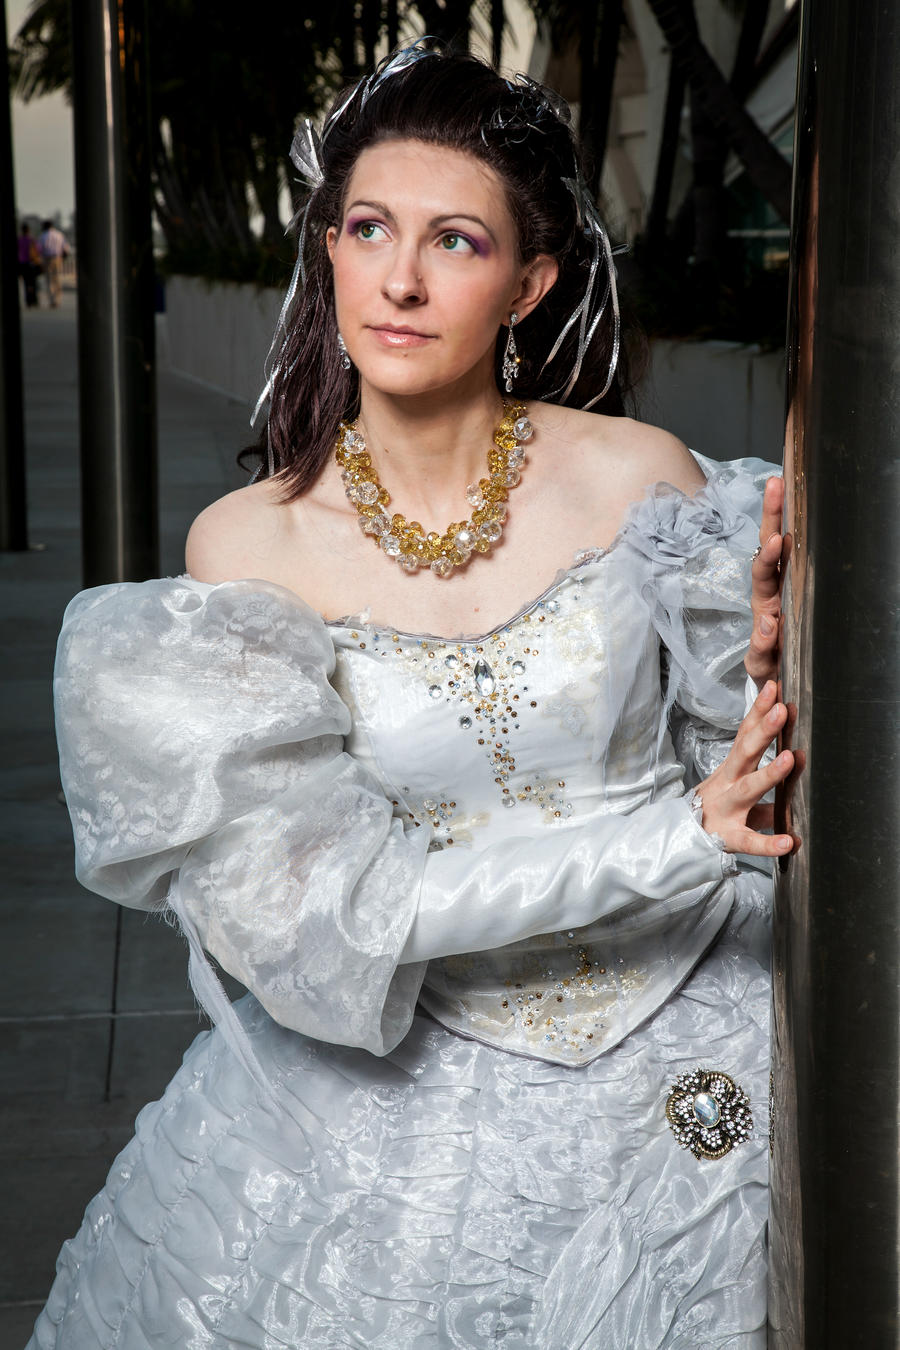 Labyrinth, Sarah by Cosmic-Empress on DeviantArt Labyrinth Movie Sarah Dress